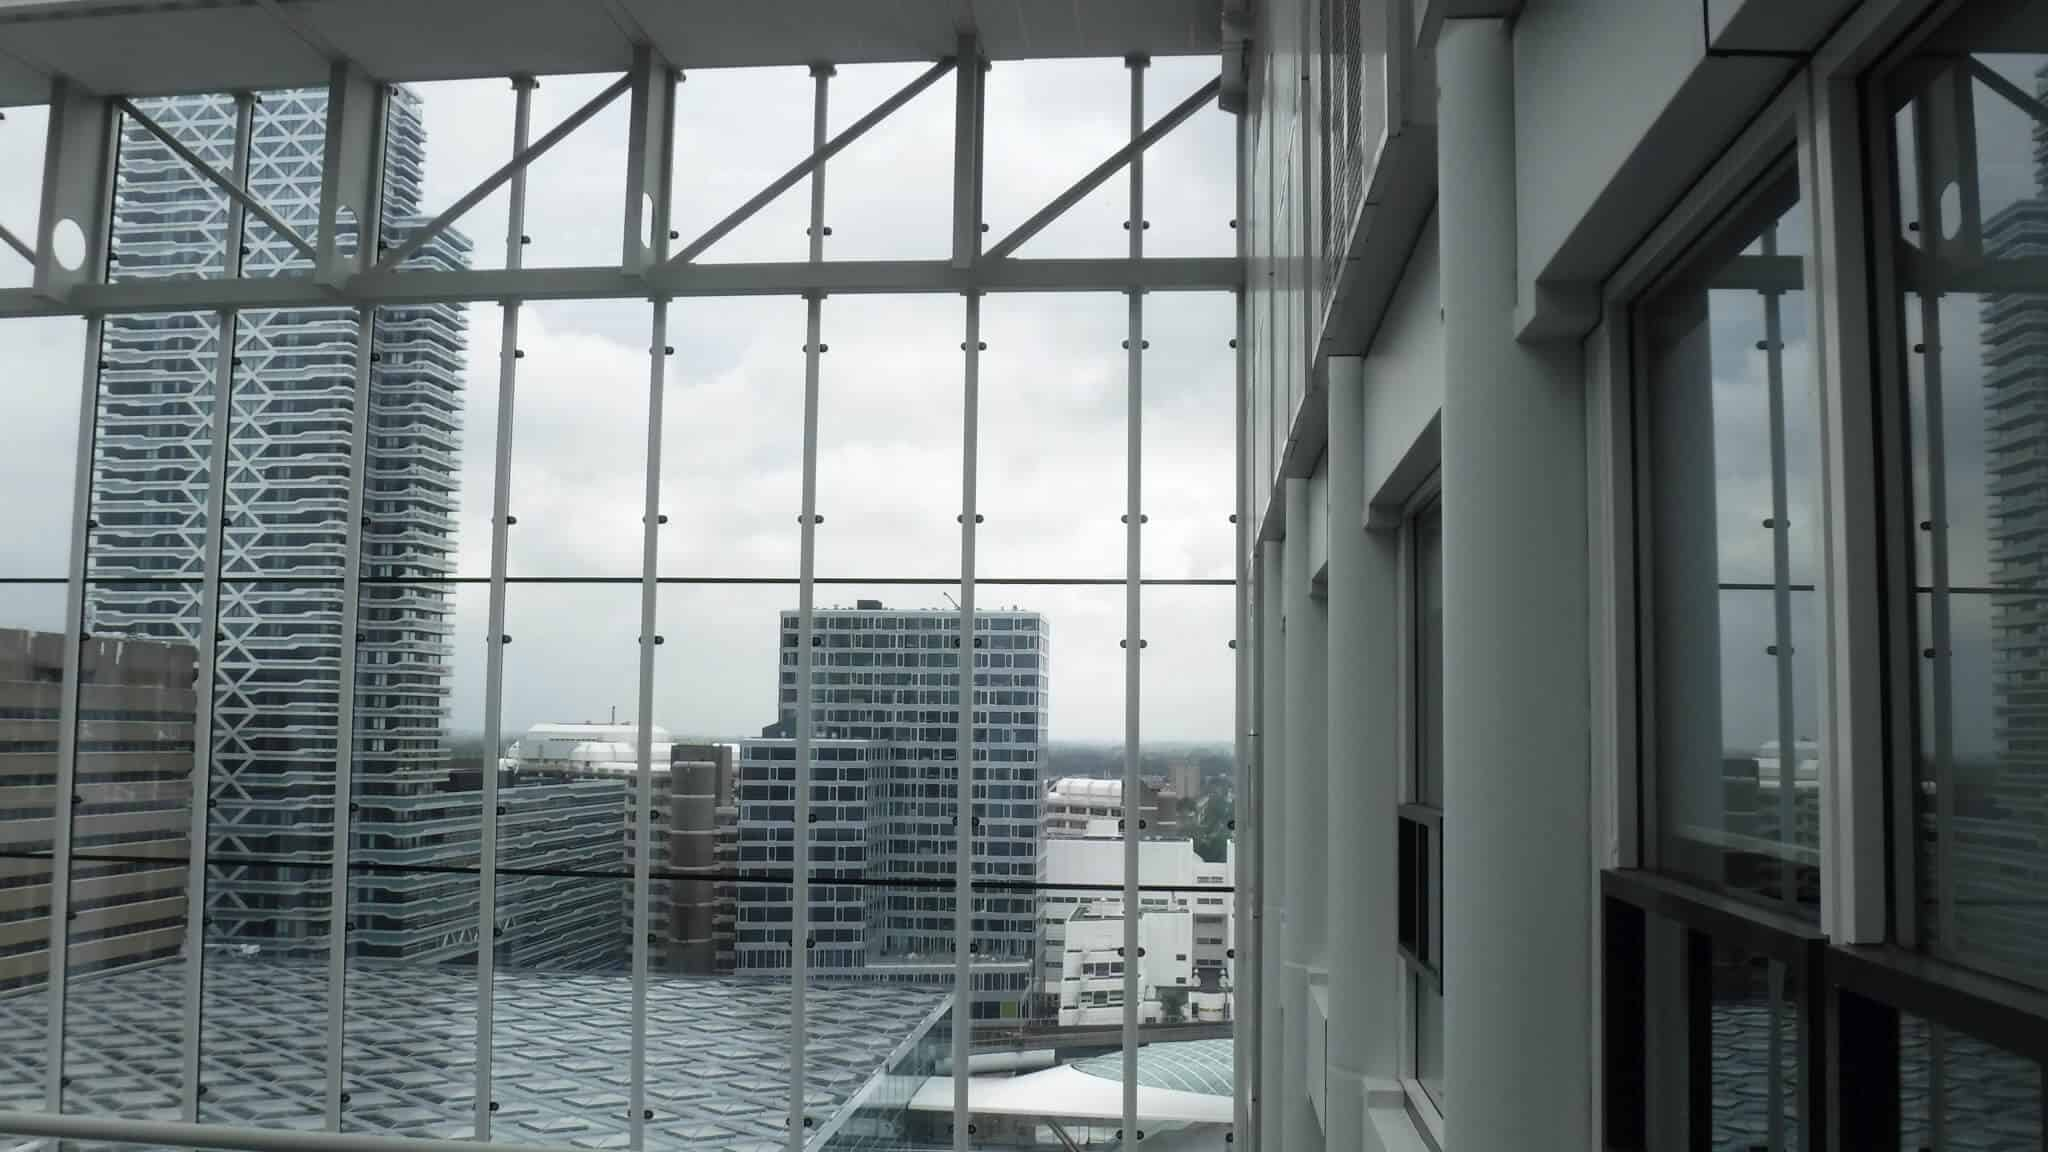 Rijksvastgoedbedrijf_Detailfoto-glasgevel